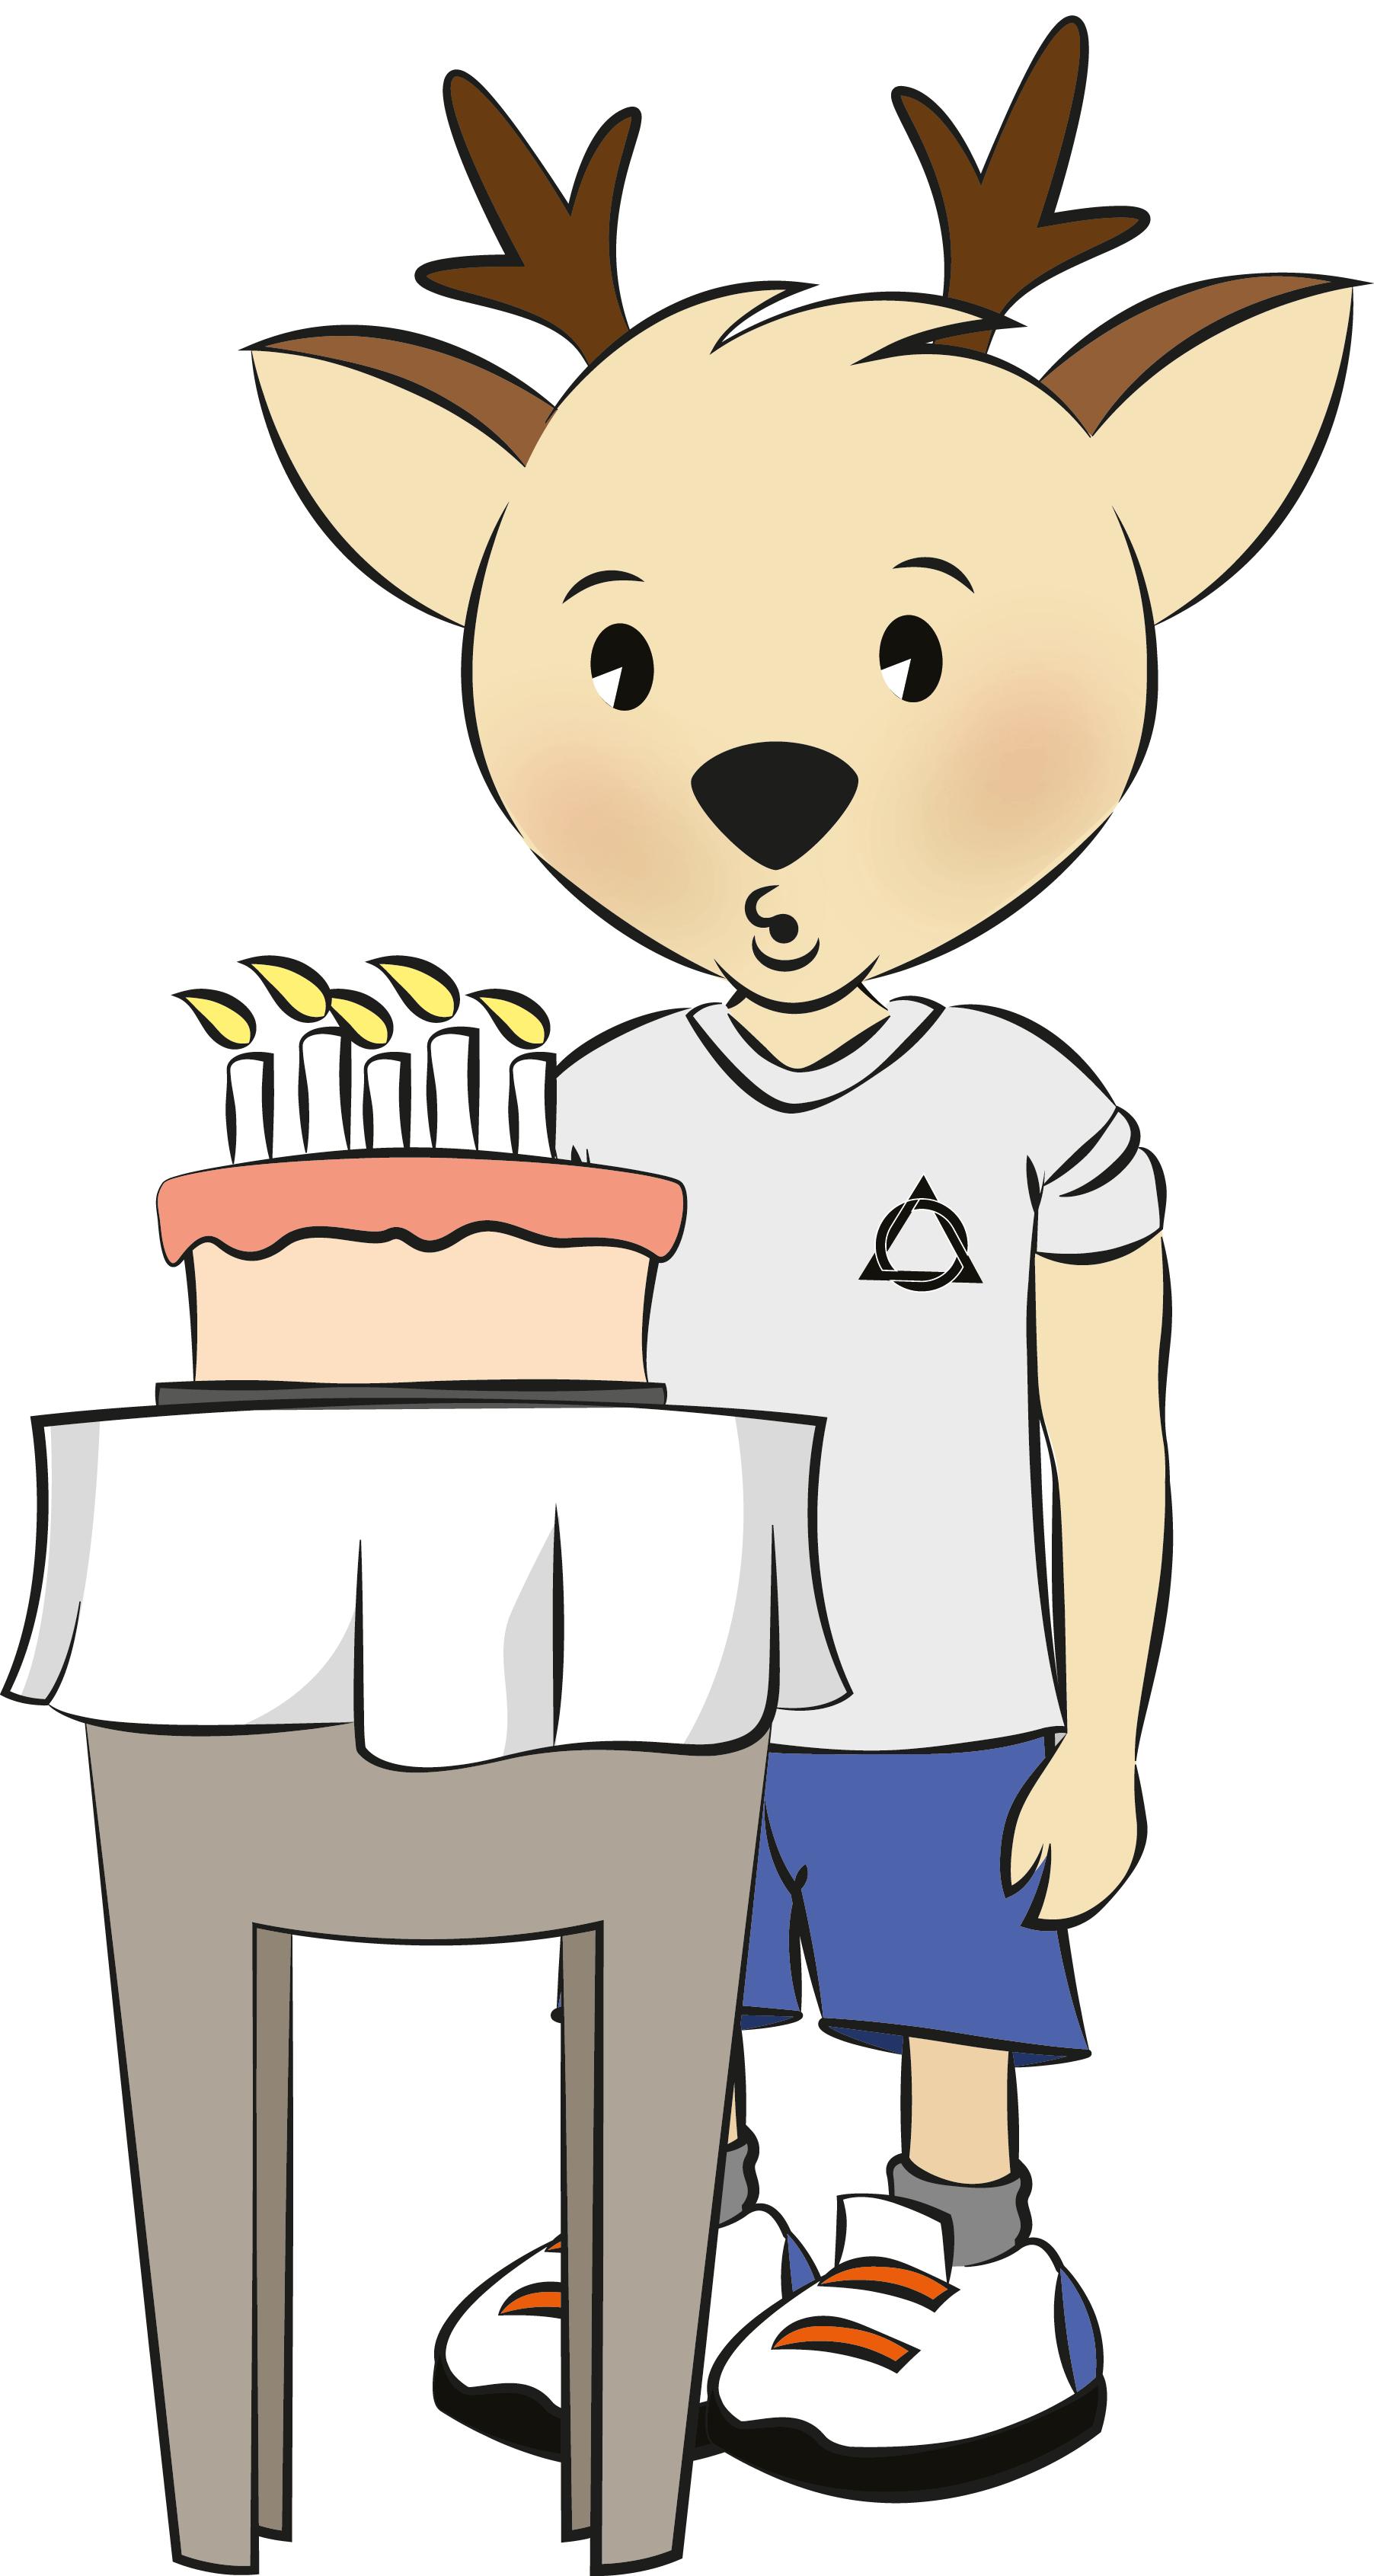 blow on cake